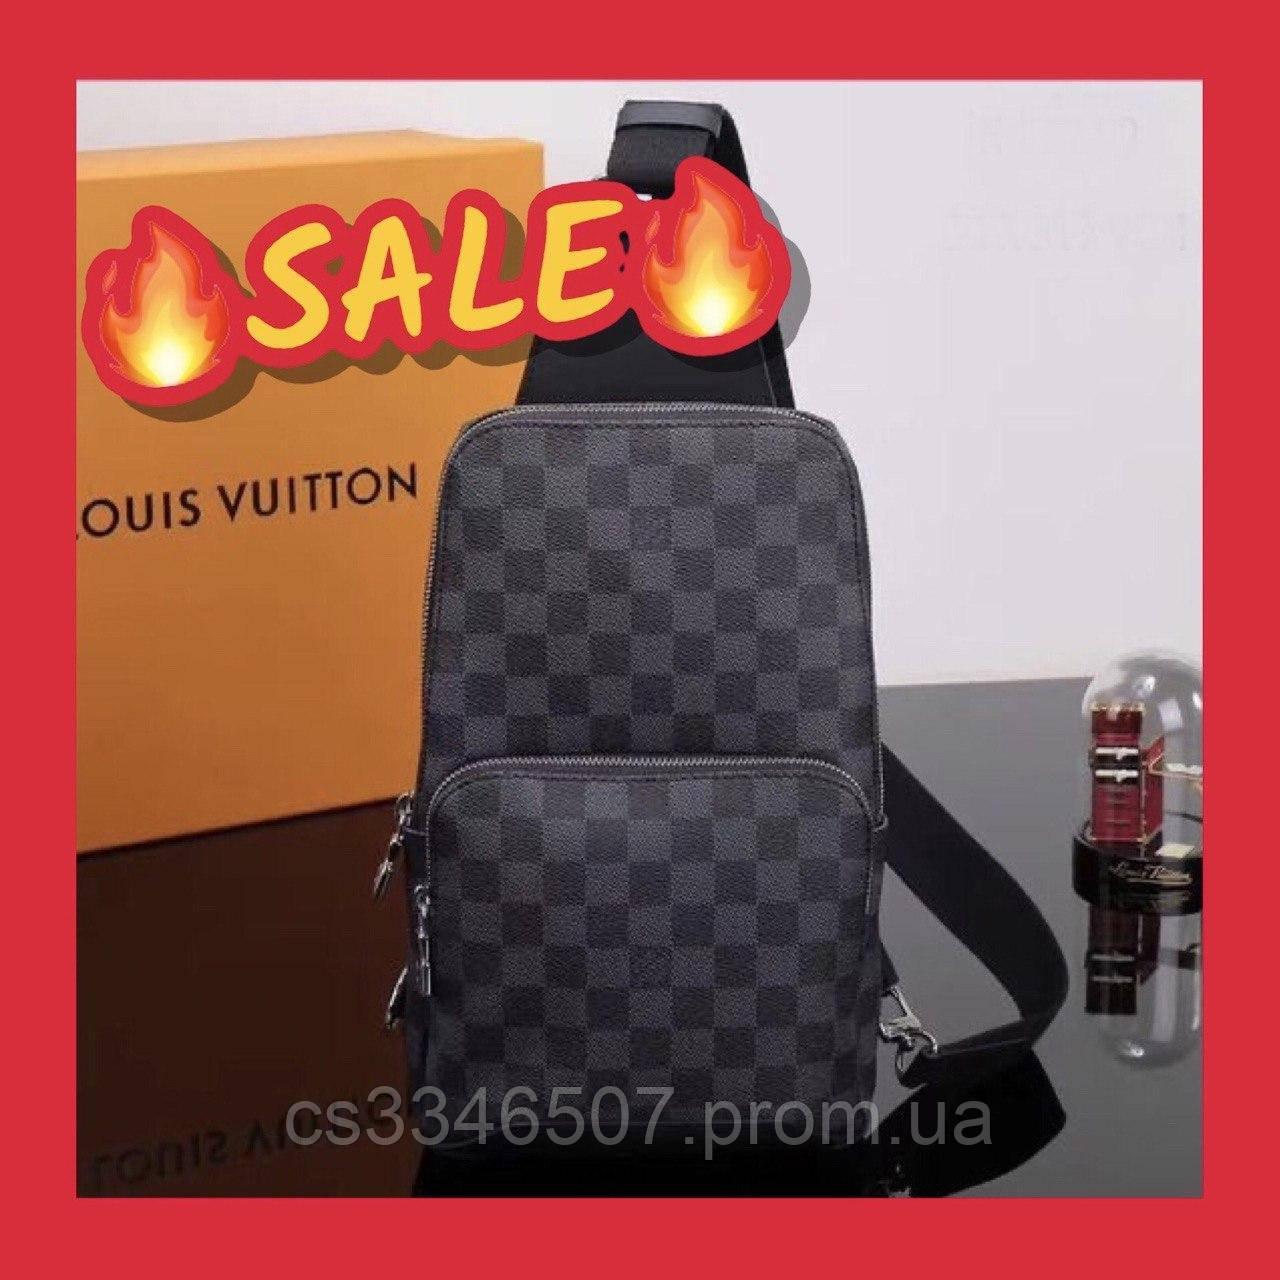 Мужская сумка Louis Vuitton Avenue Damier Graphite. Сумка Луи Виттон